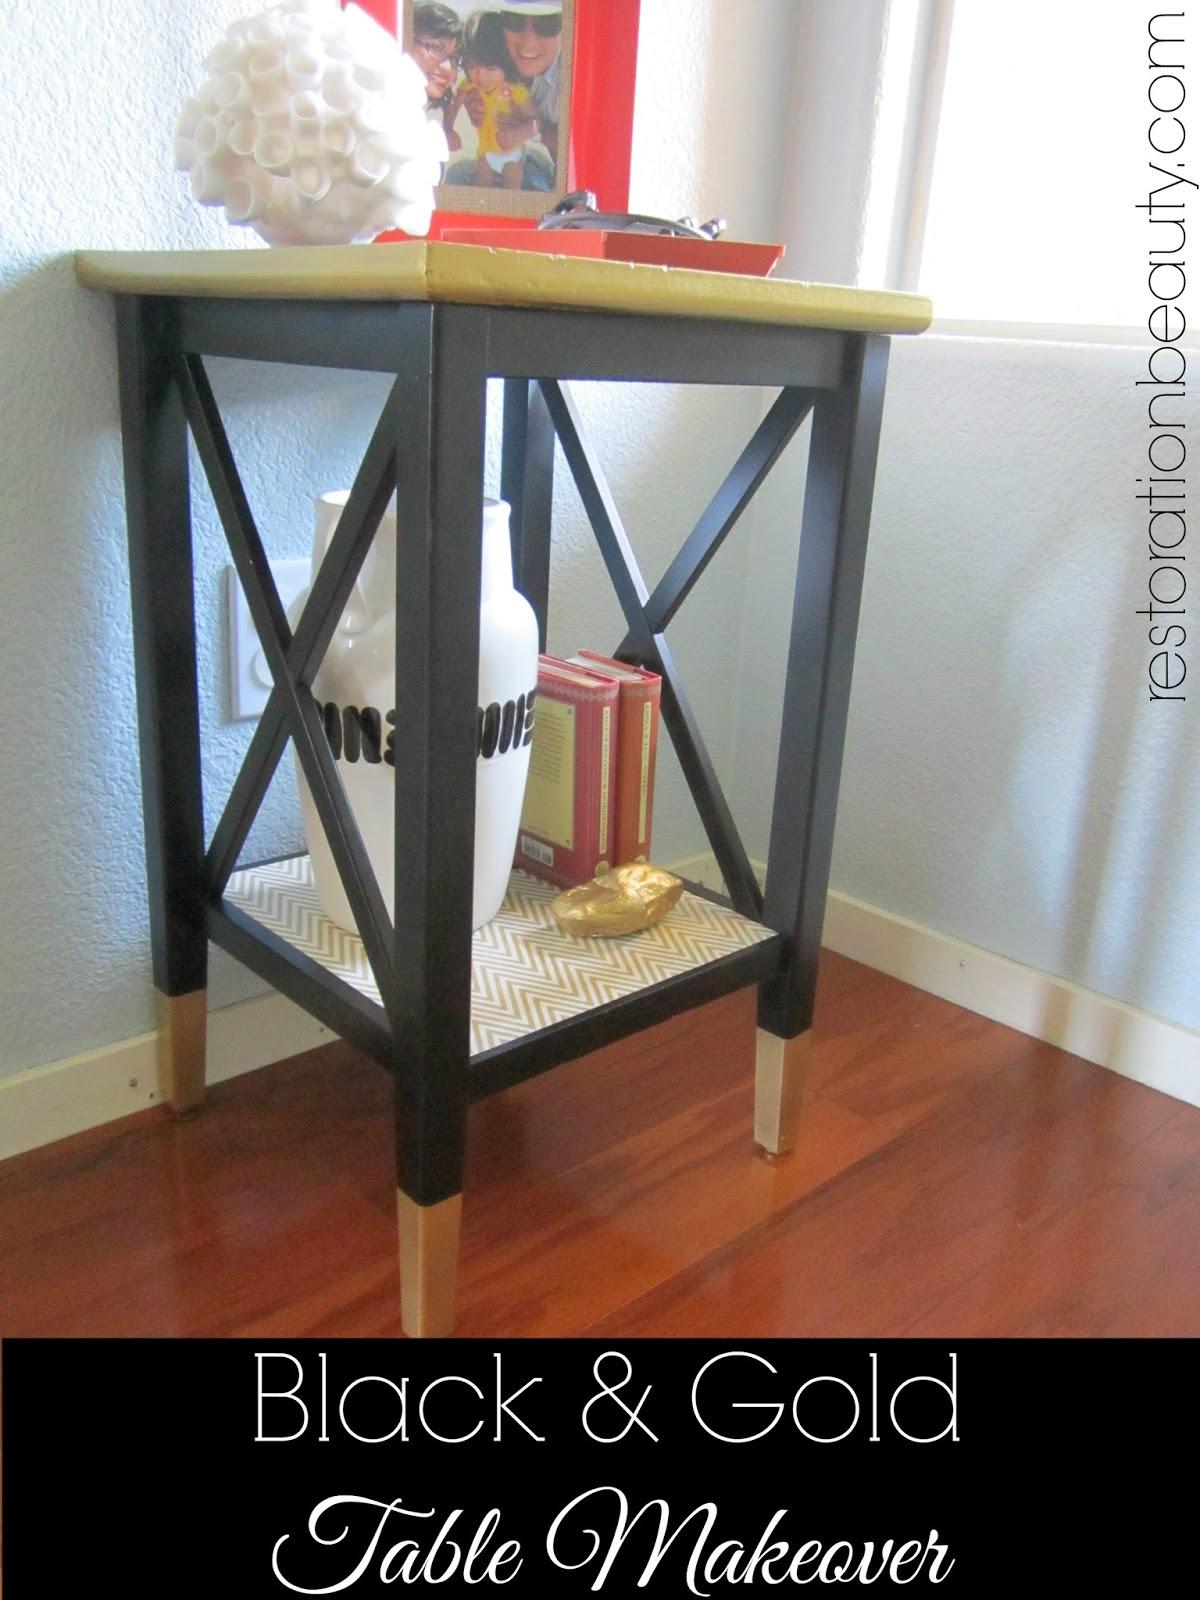 Black & Gold Table Makeover